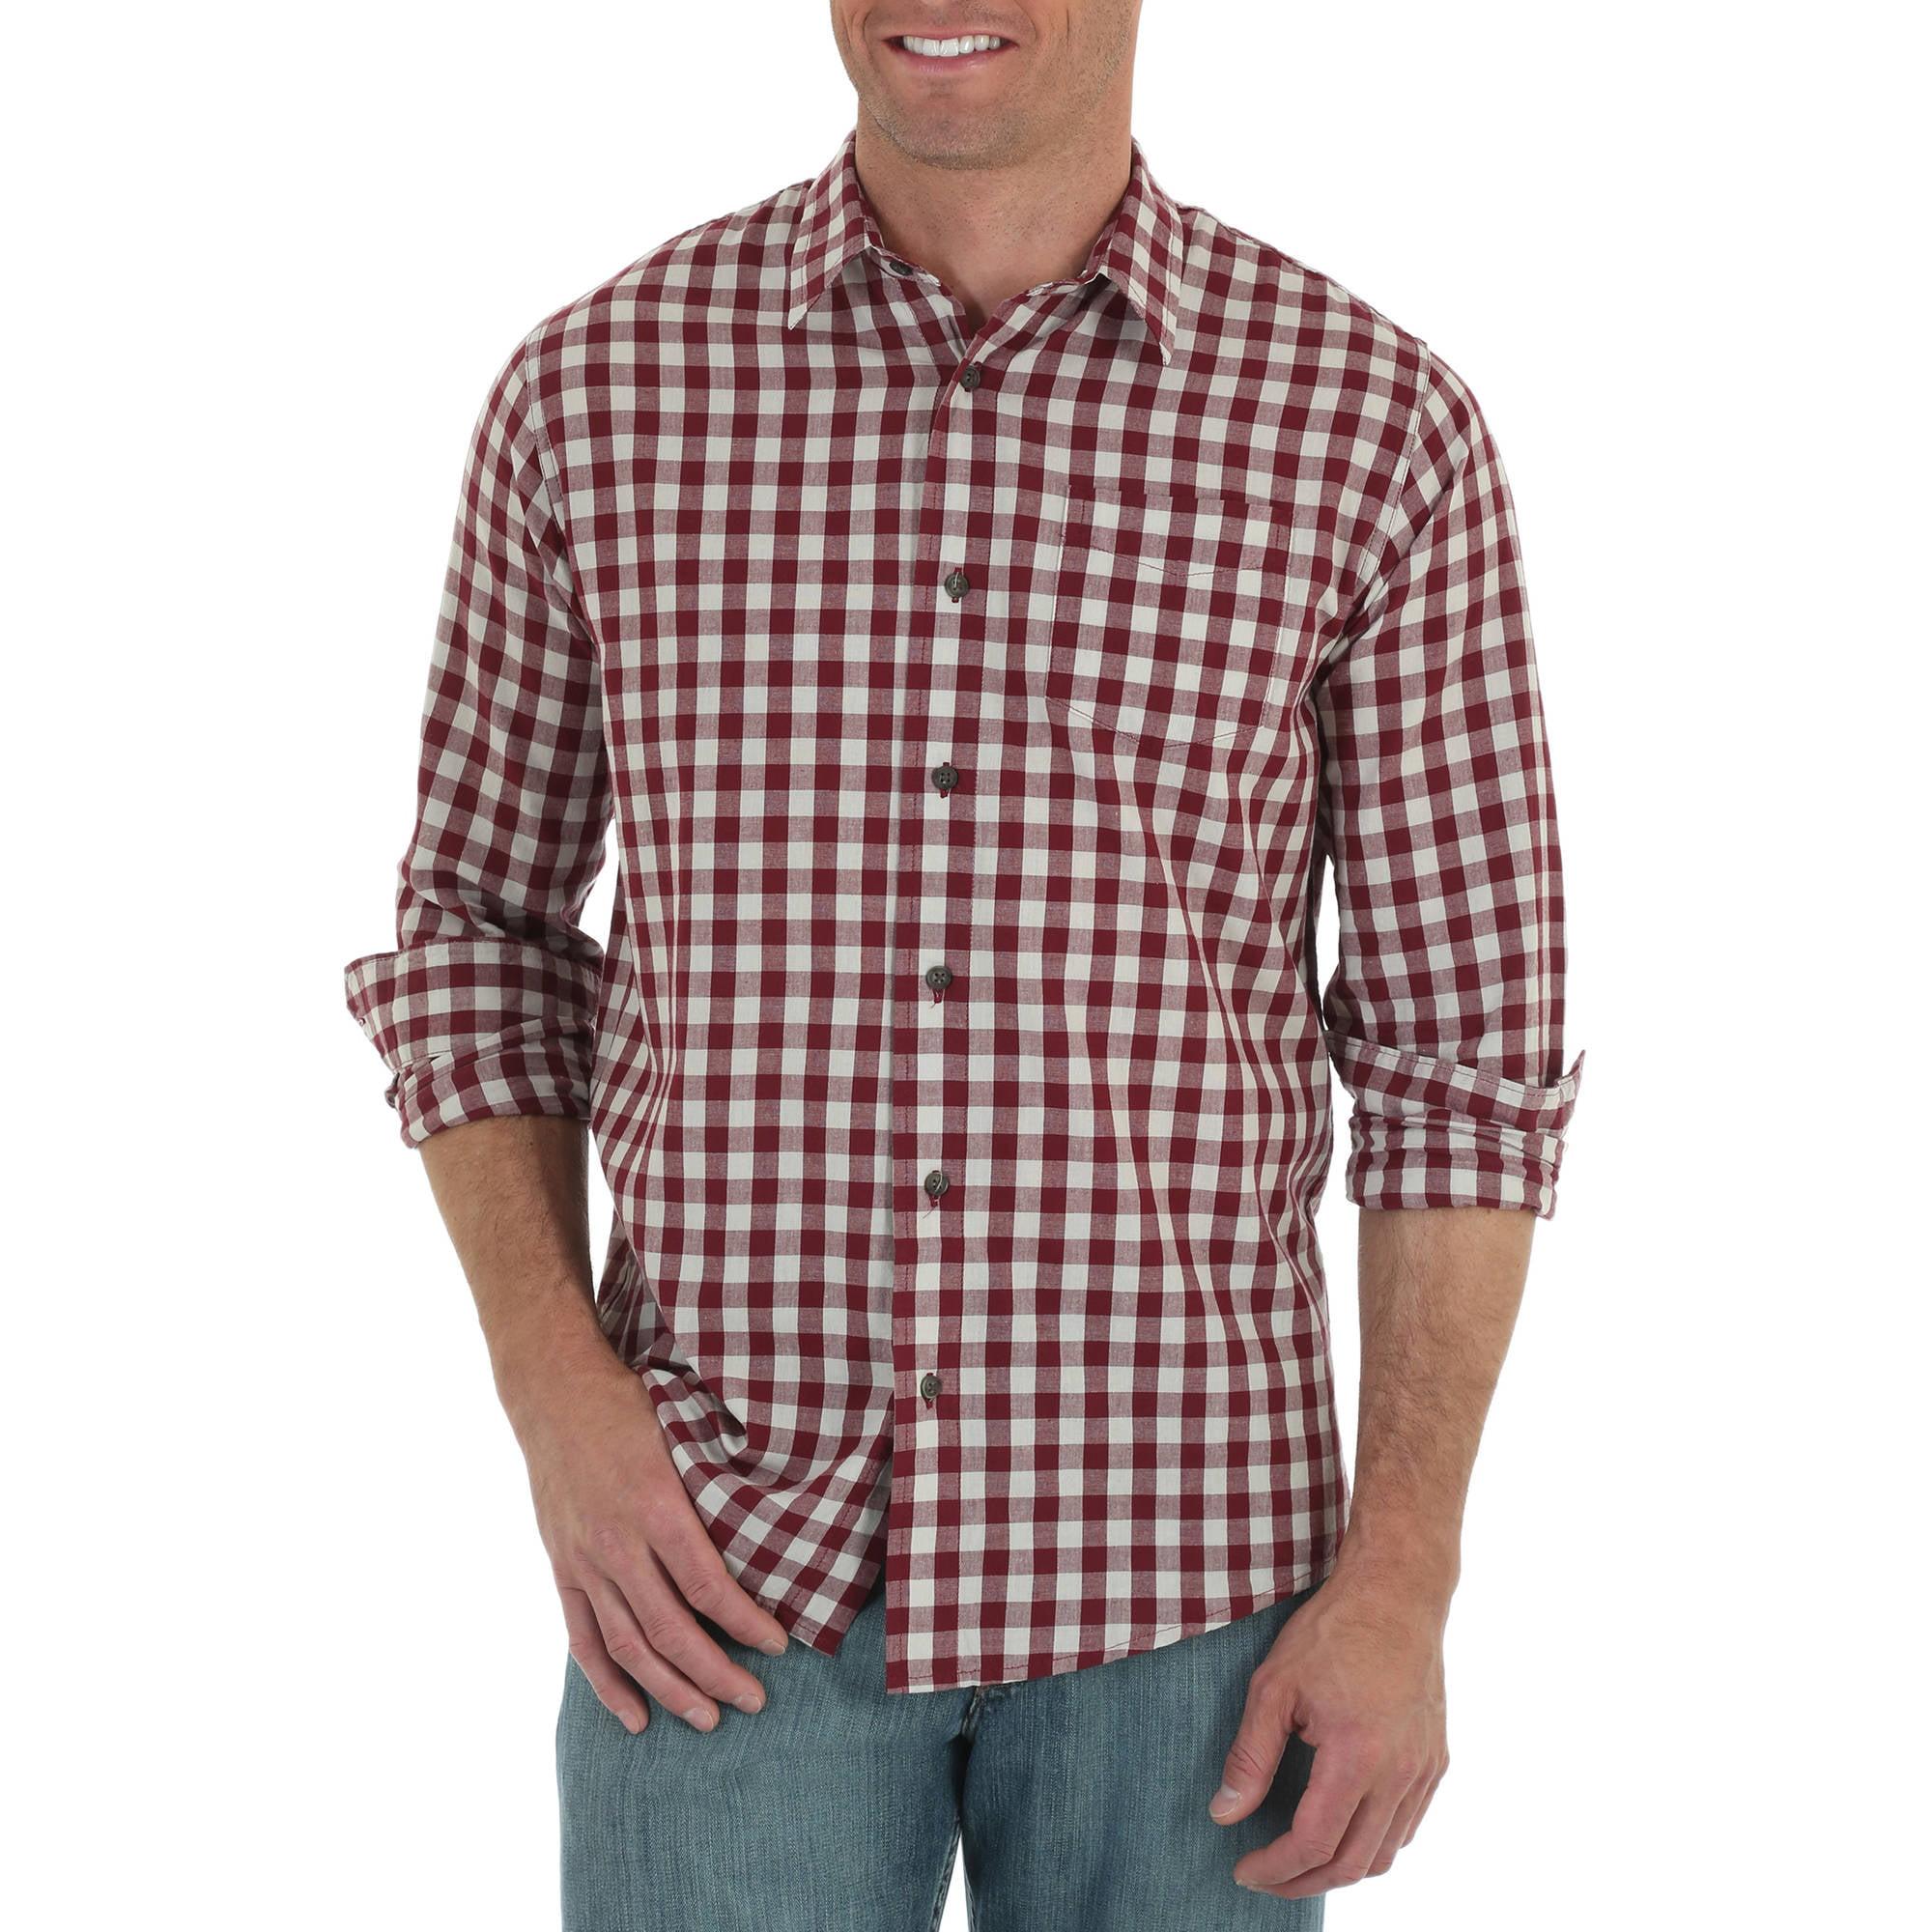 Jeans Co. Men's Long Sleeve Woven Shirt